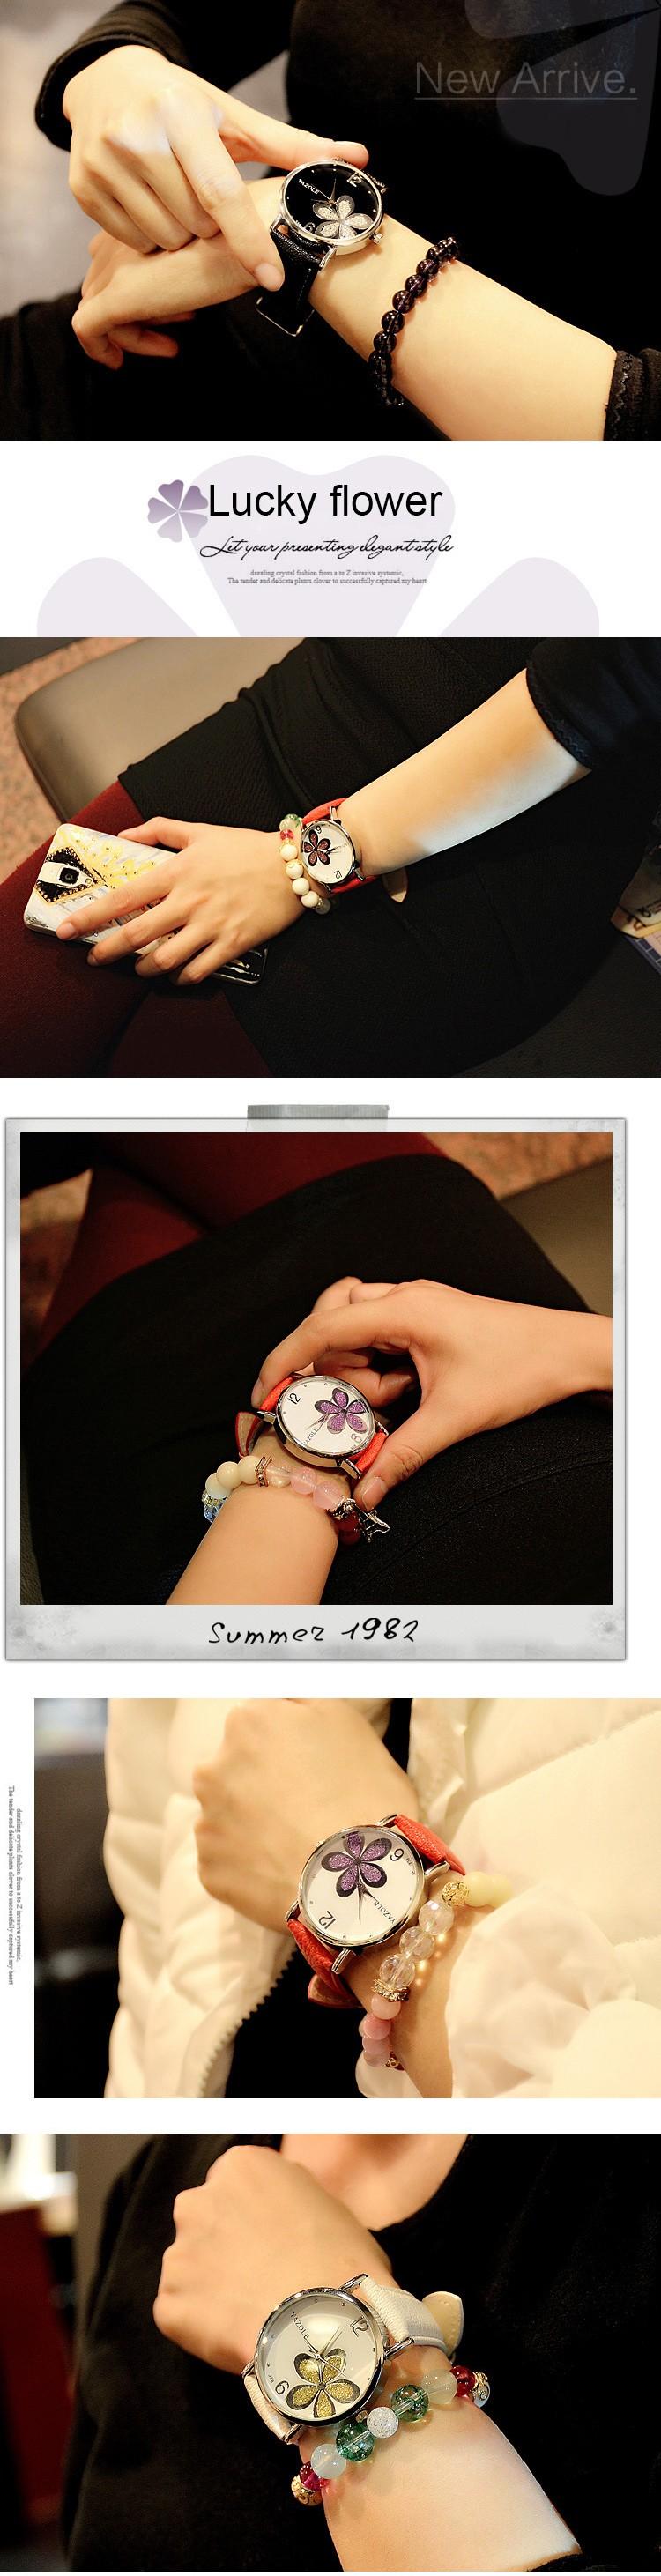 New Quartz Watch Women Watches Famous Brand 2016 Wristwatches Female Clock Wrist Watch Ladies Girl Quartz-watch Relogio Feminino